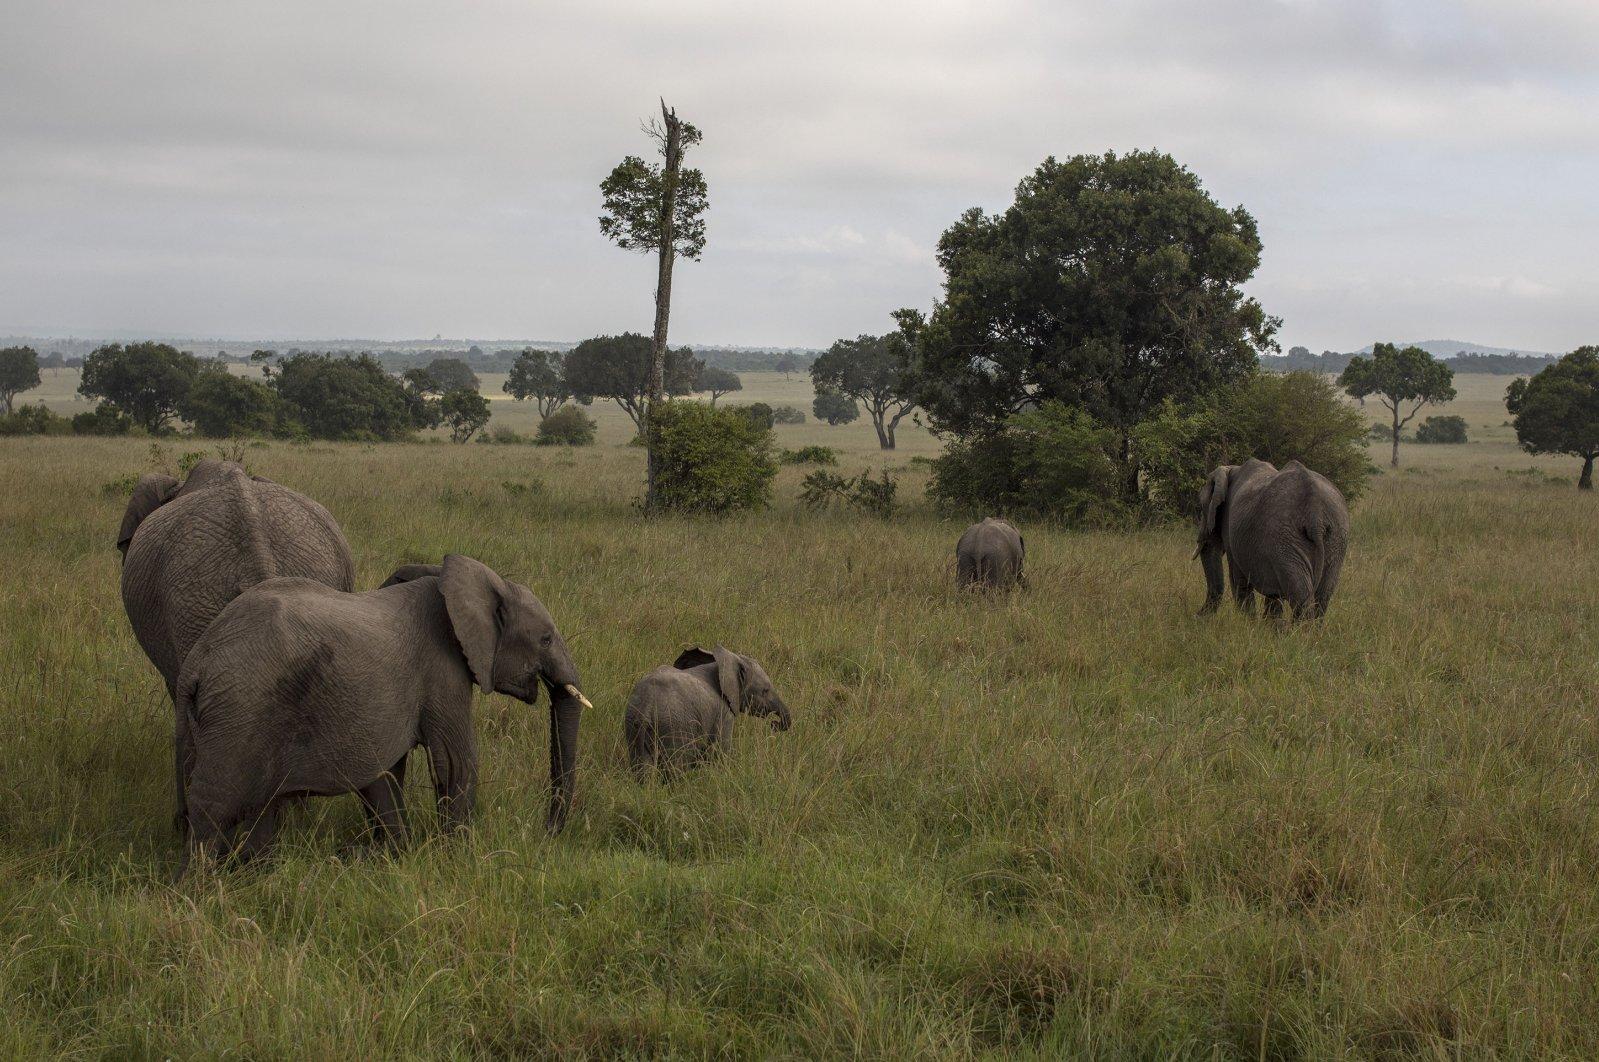 A herd of elephants graze in plains of the Mara North Conservancy, Kenya, Dec 21, 2020. (Getty Images)